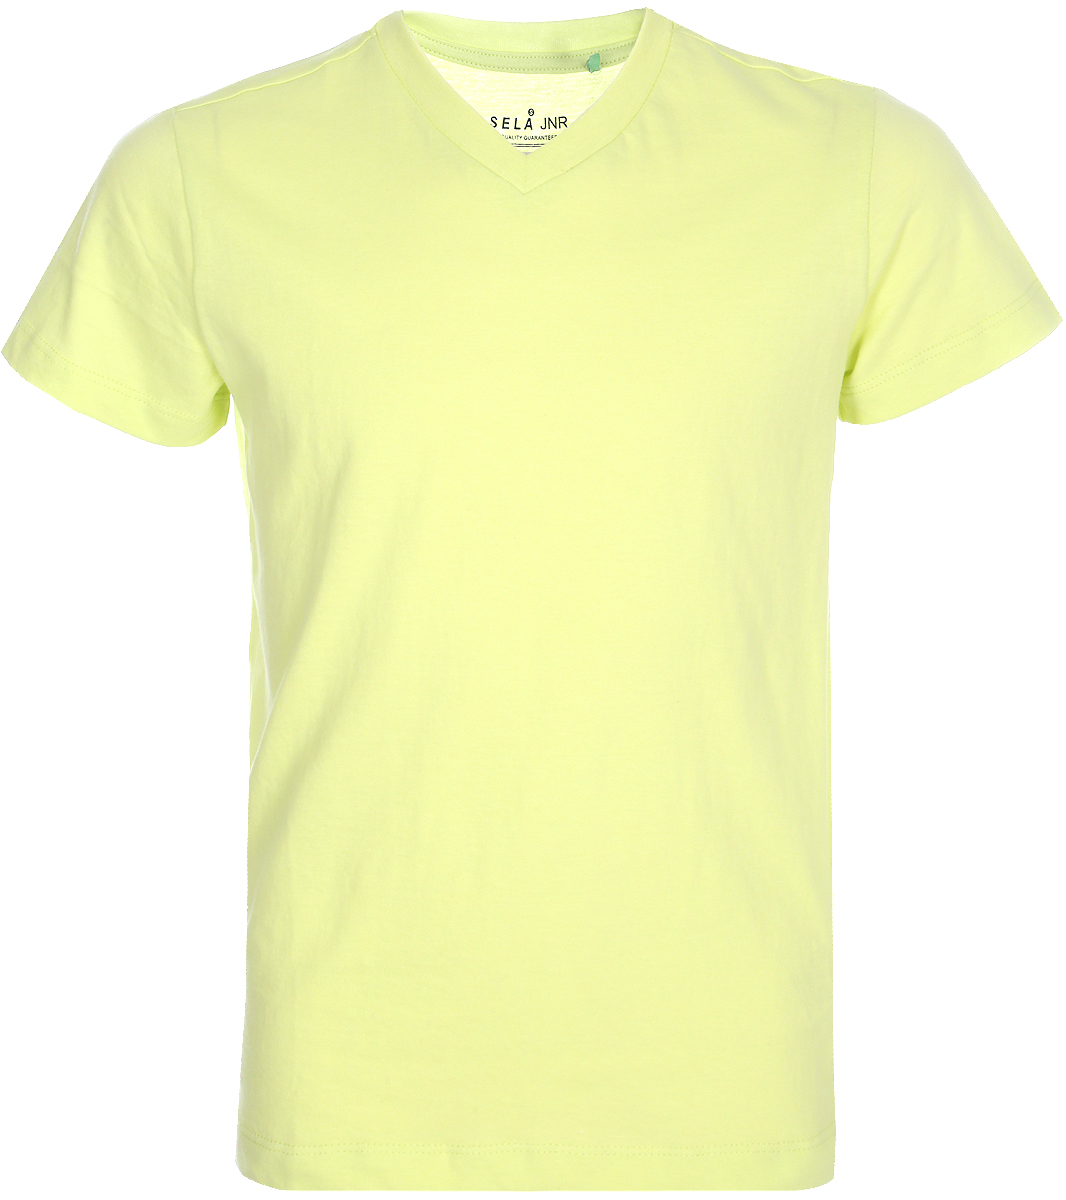 Футболка для мальчика Sela, цвет: желтый. Ts-811/303-8152. Размер 122Ts-811/303-8152